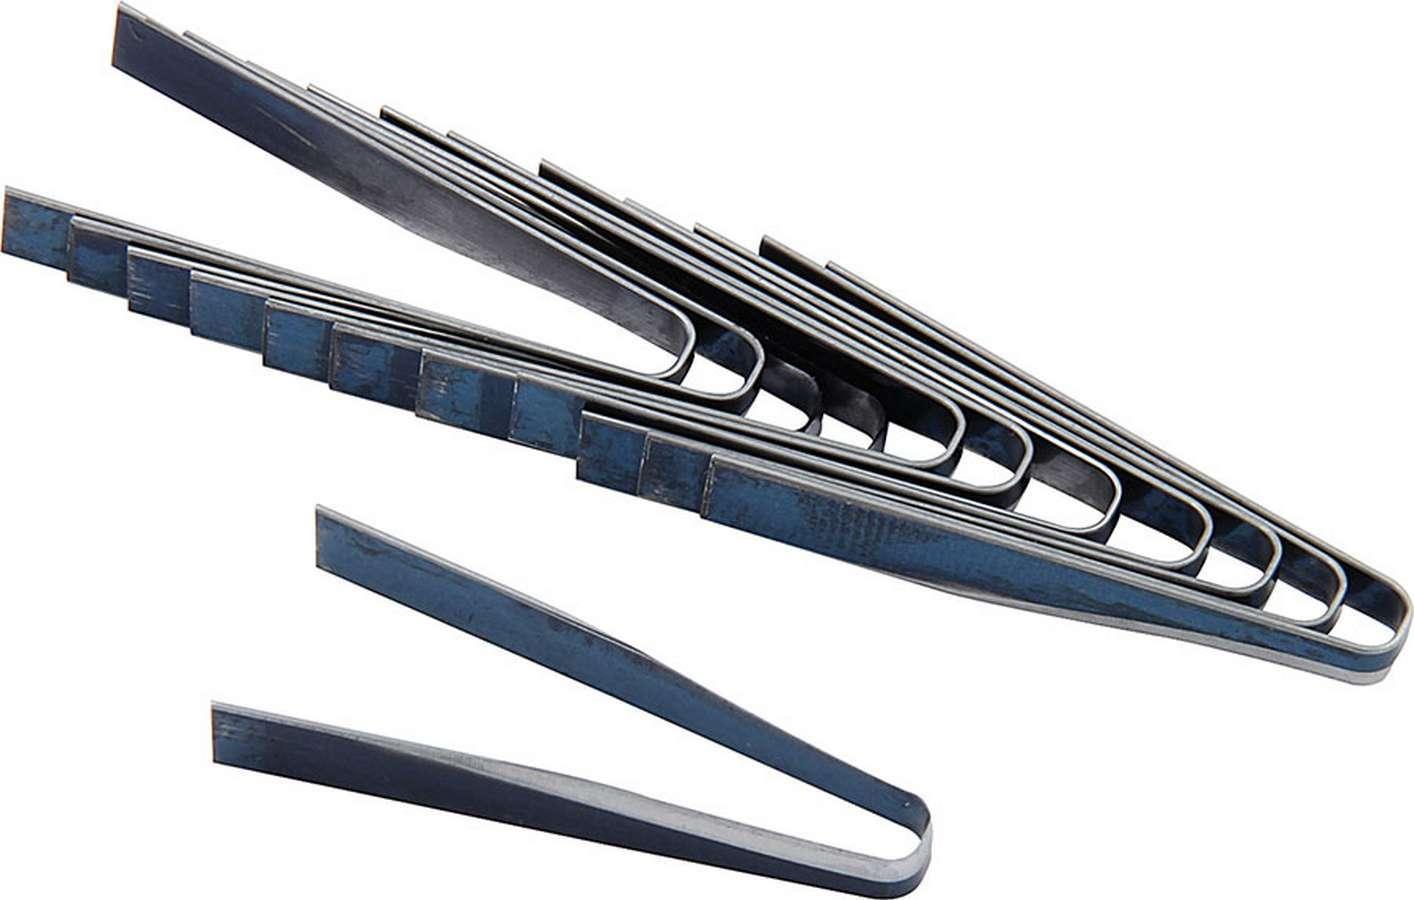 Allstar Performance Flat #14 Blades 14/32in